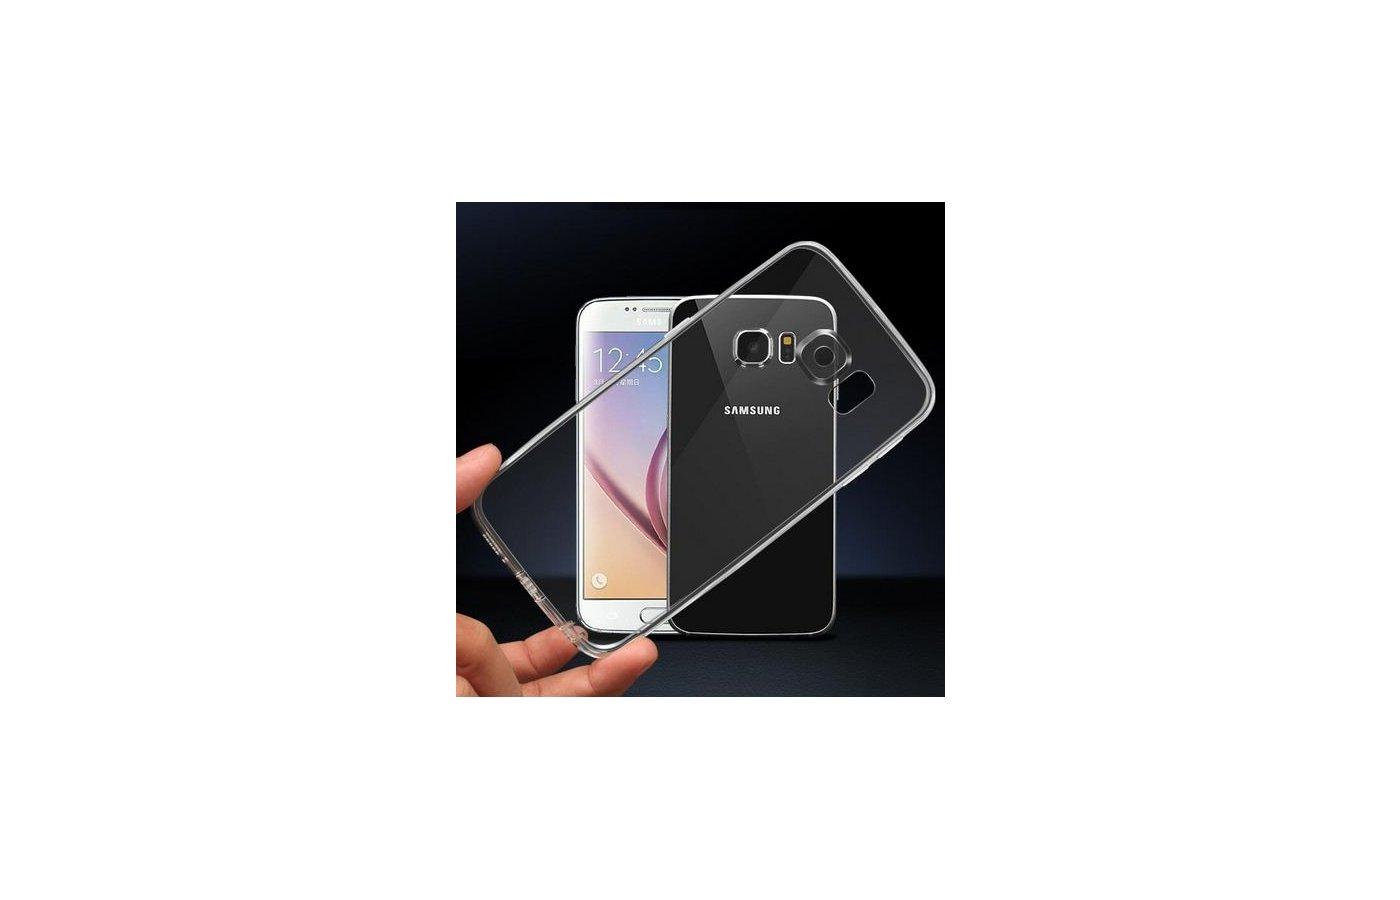 Чехол iBox Crystal для Samsung Galaxy S7 Edge (SM-G935) прозрачный